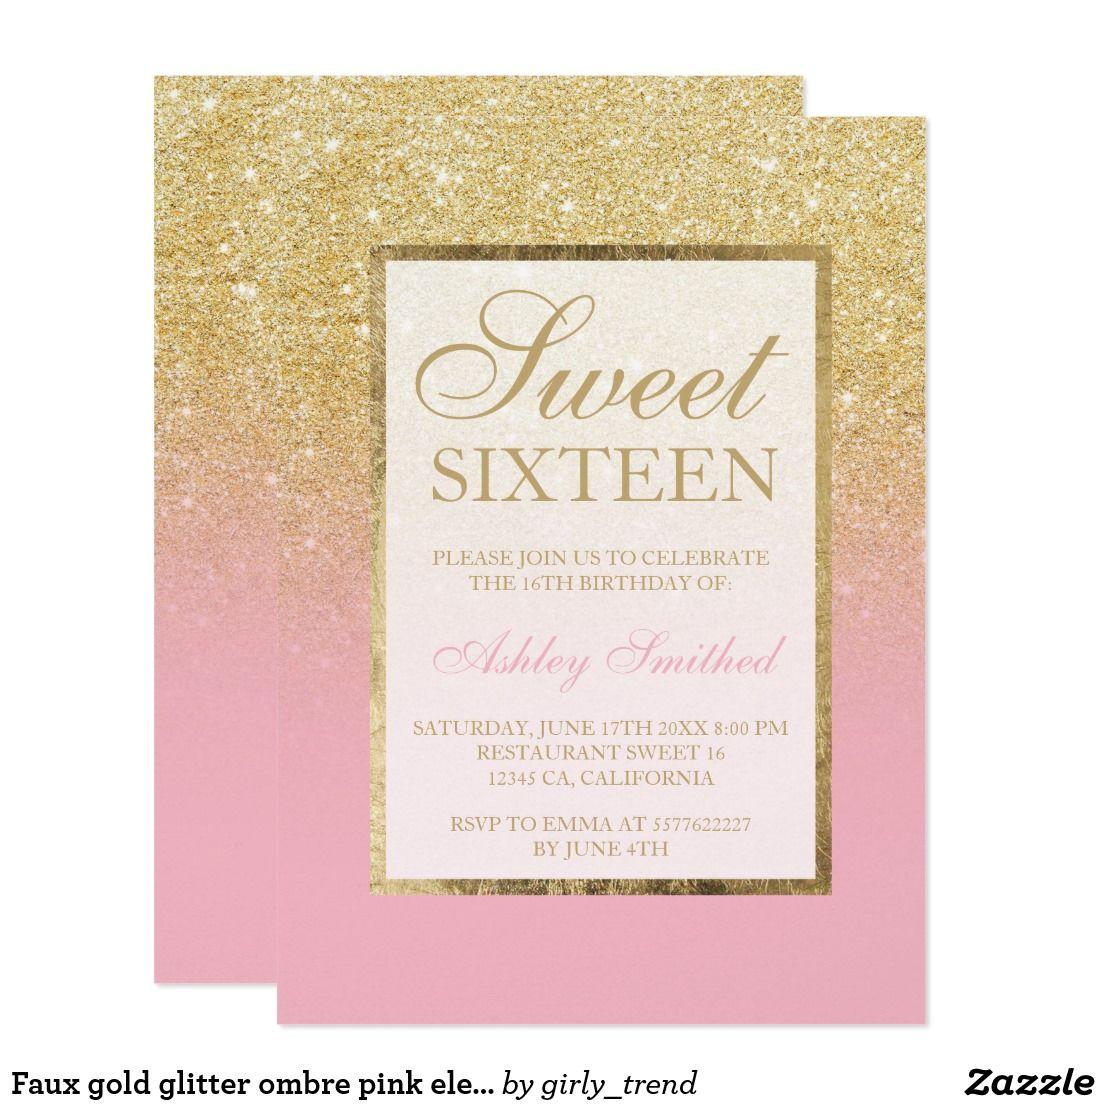 Faux gold glitter ombre pink elegant Sweet sixteen Invitation | Zazzle.com